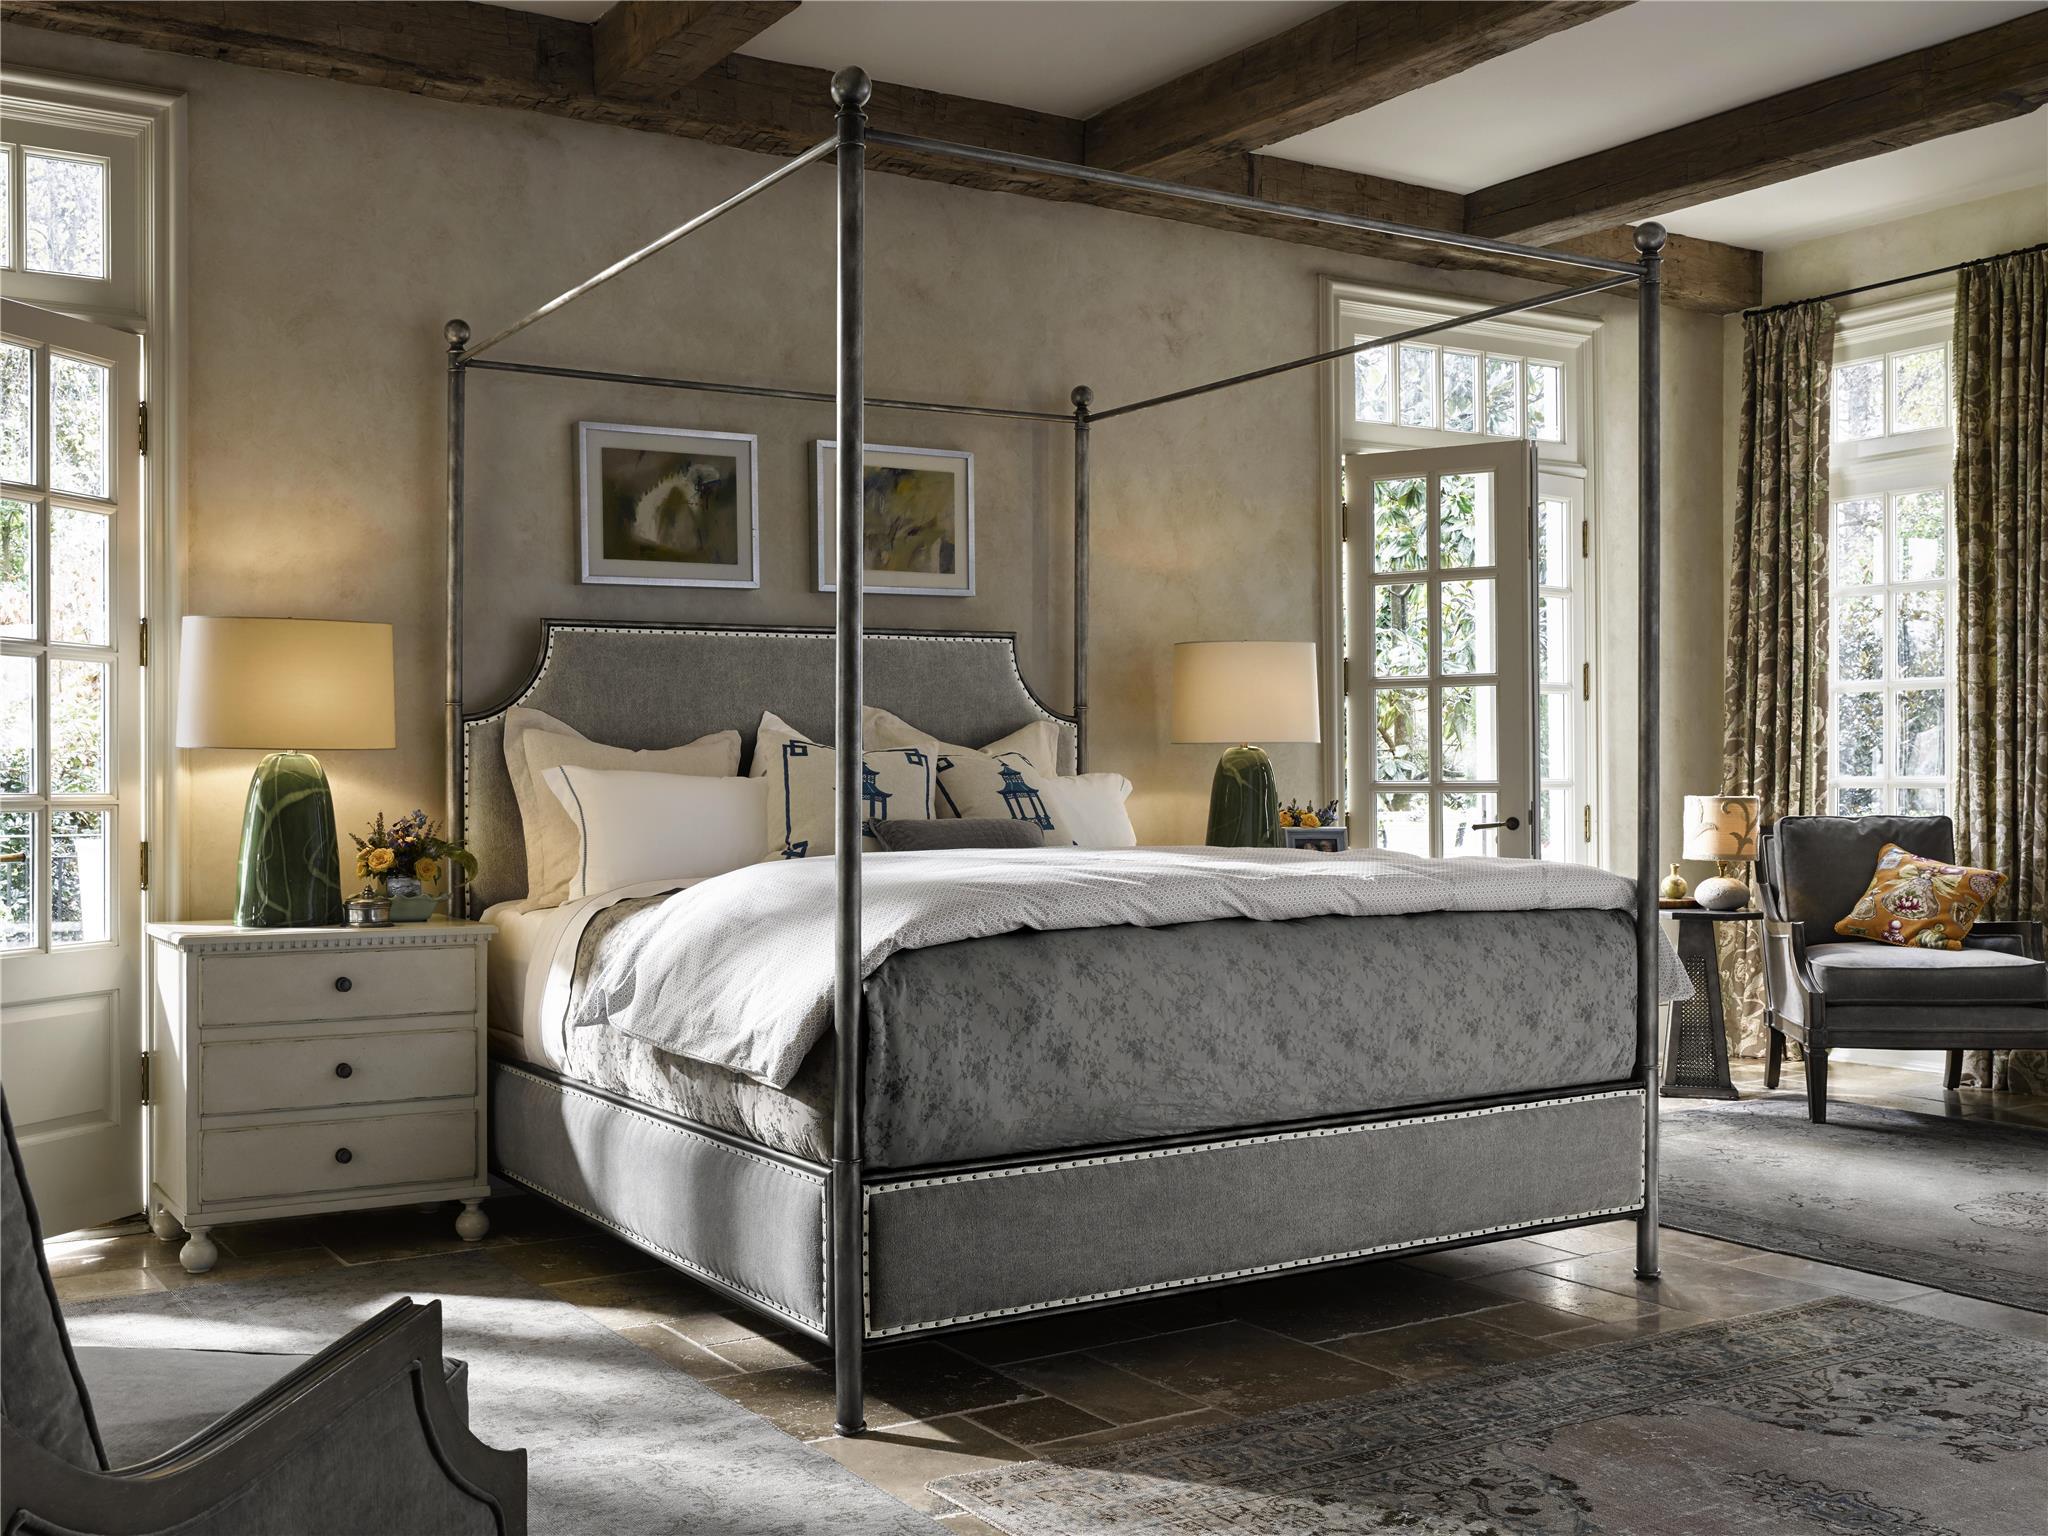 Universal Furniture Sojourn Respite Bed Queen